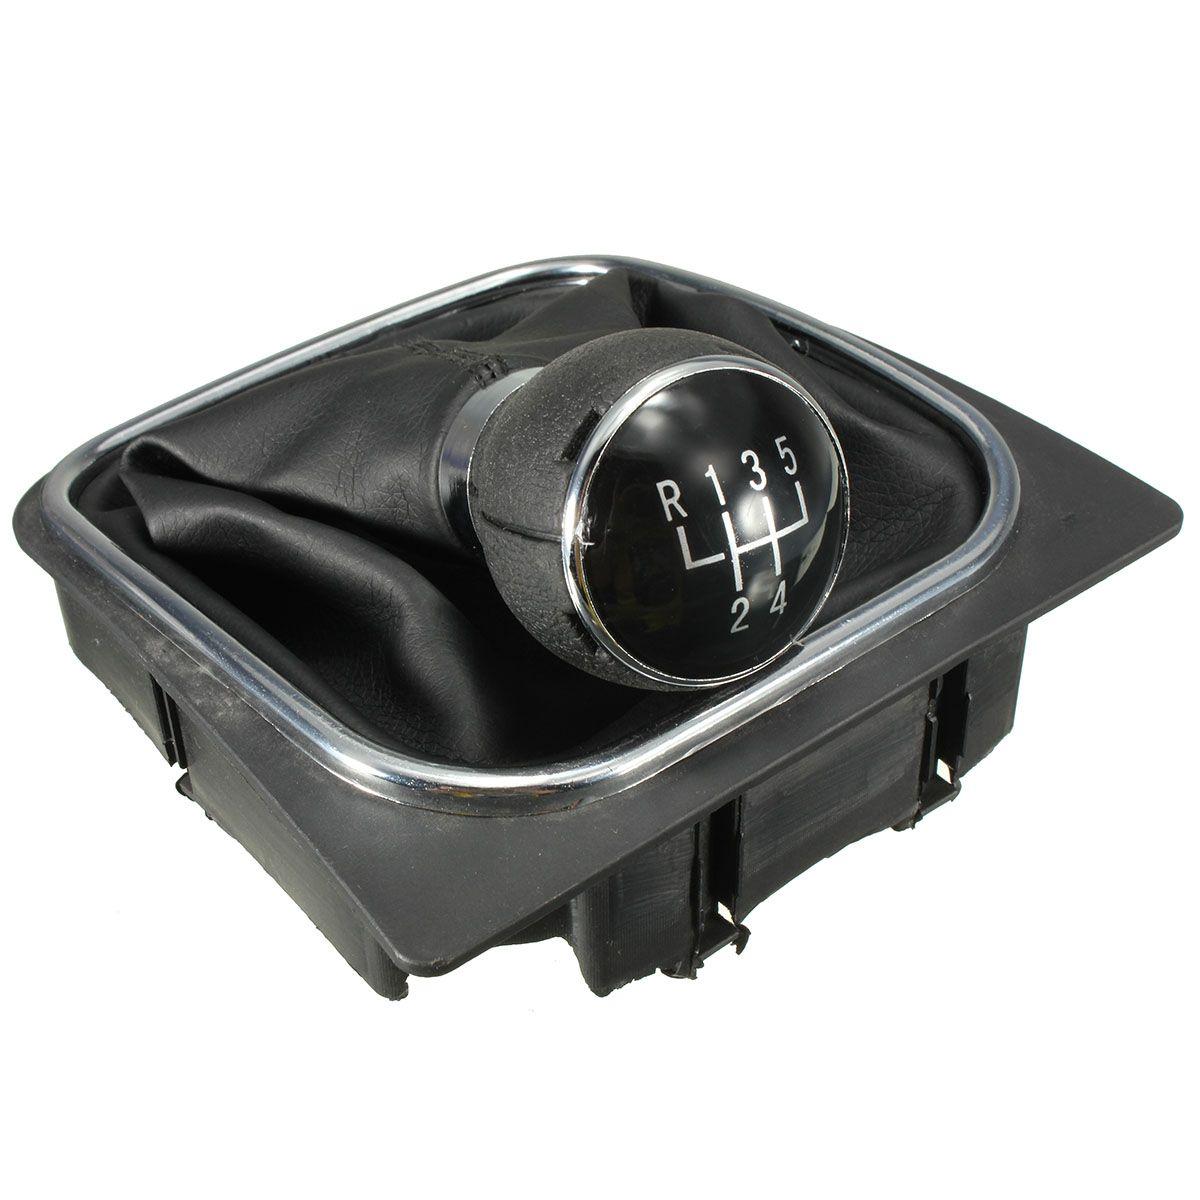 New 5 Speed Car Gear Shift Knob Gaitor Boot PU Leather Black For VW Golf 6 MK5 MK6 2005-2014